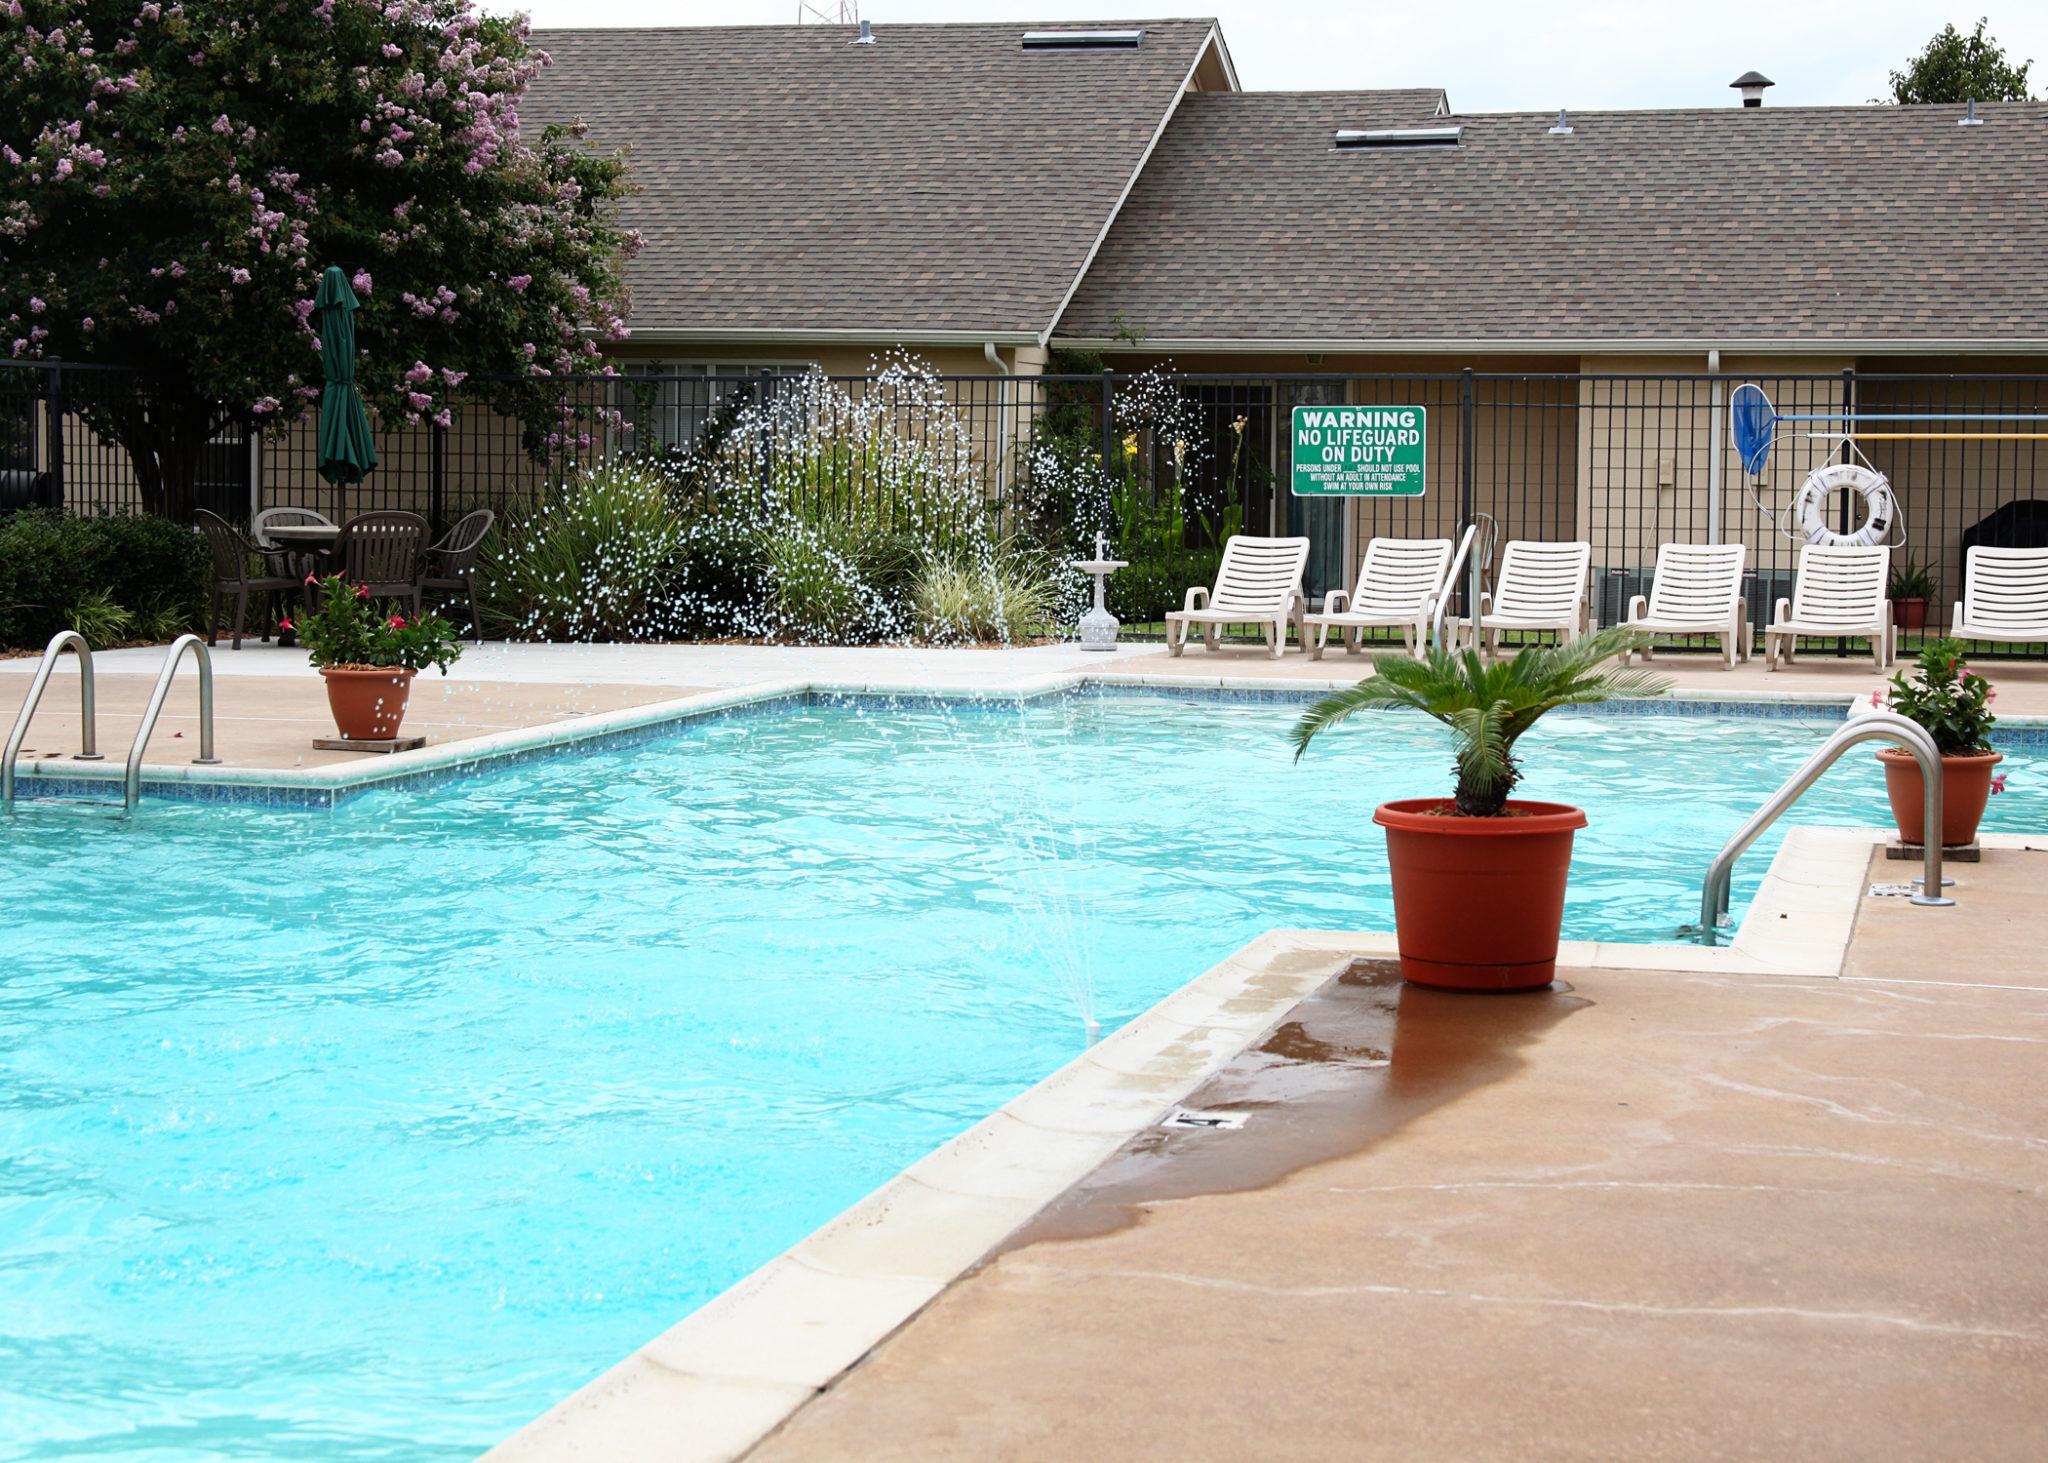 Ridgeview Townhomes, Paris, TX, Pool1